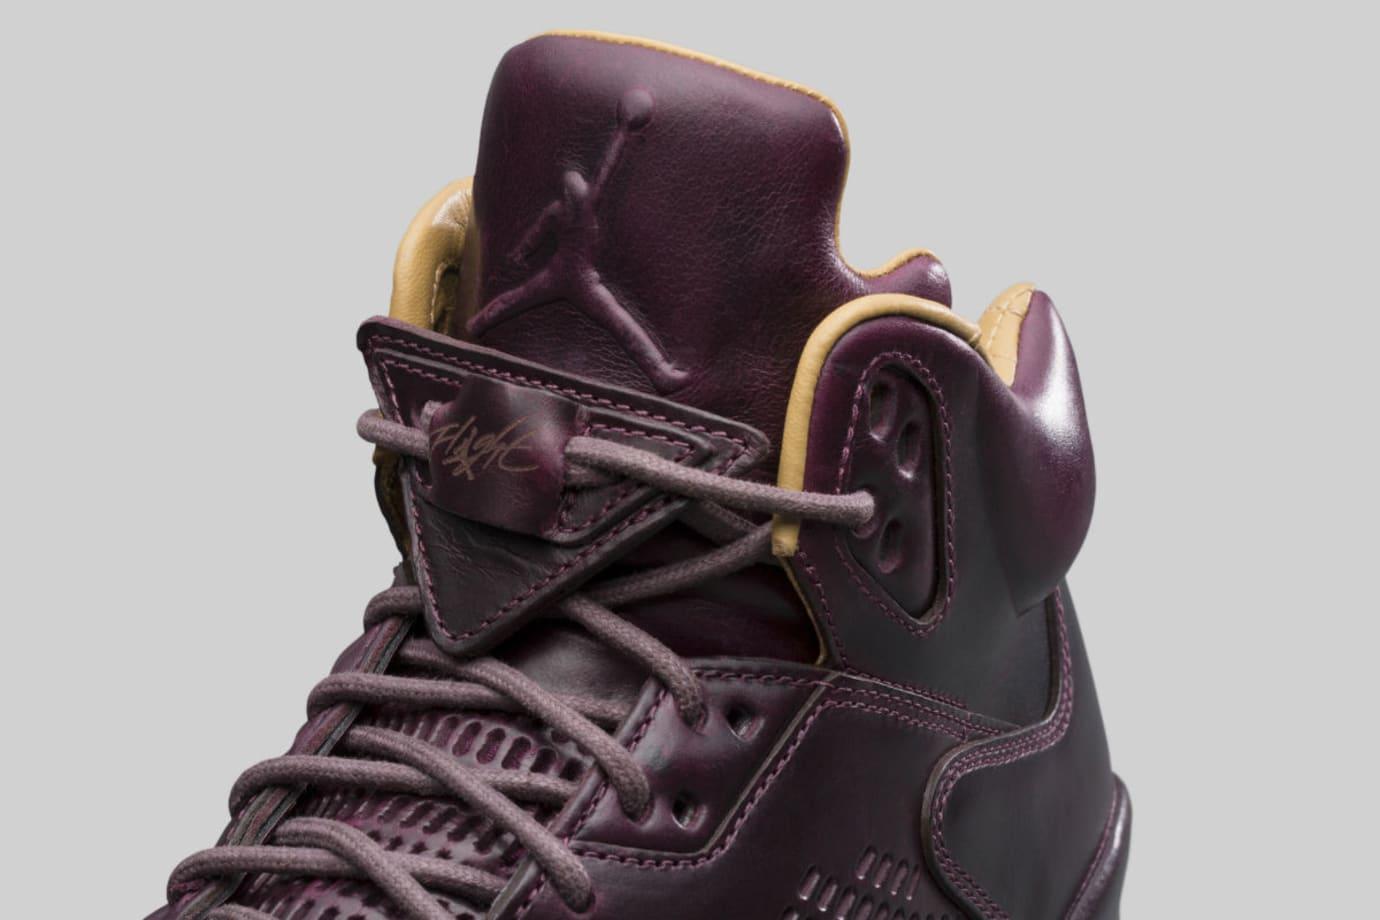 Air Jordan 5 Premium Bordeaux Release Date Tongue 881432-612